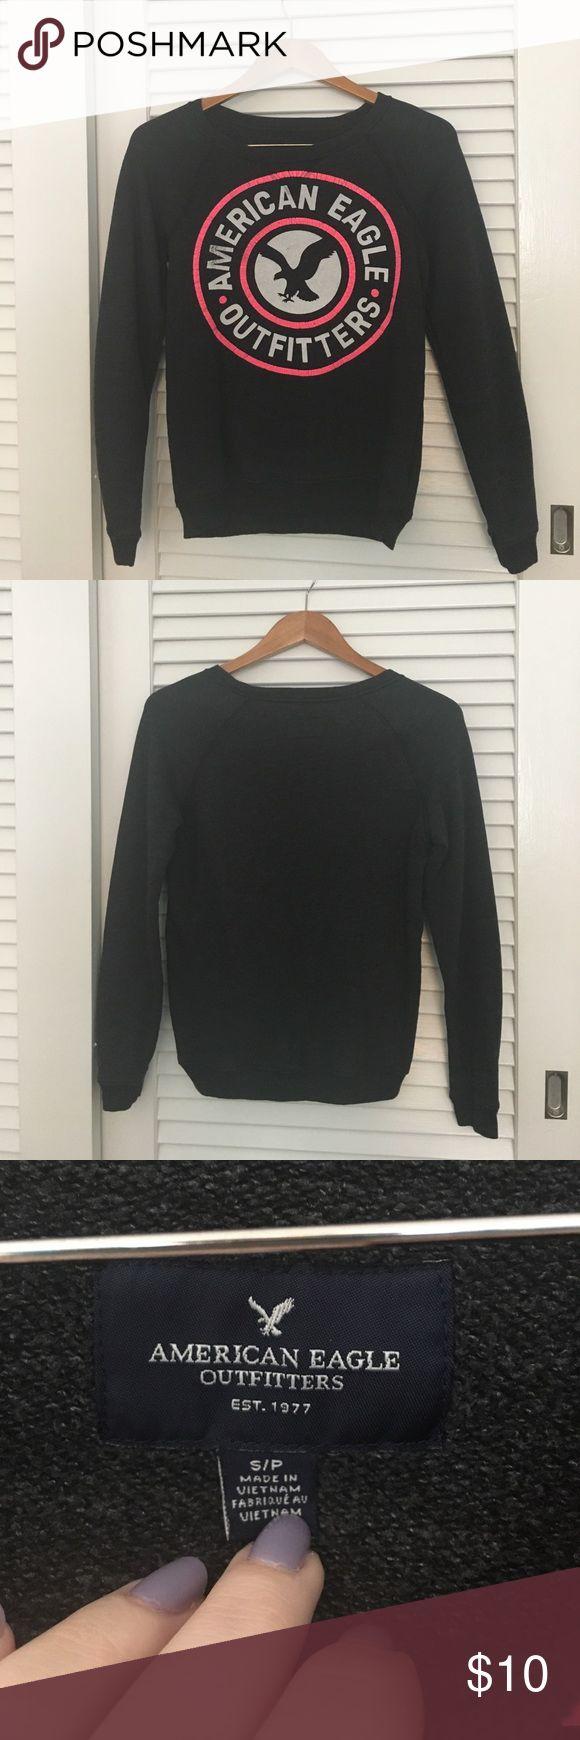 American Eagle Sweatshirt Lightweight charcoal grey sweatshirt, American Eagle logo on the front, plain back. Smoke free home. American Eagle Outfitters Tops Sweatshirts & Hoodies